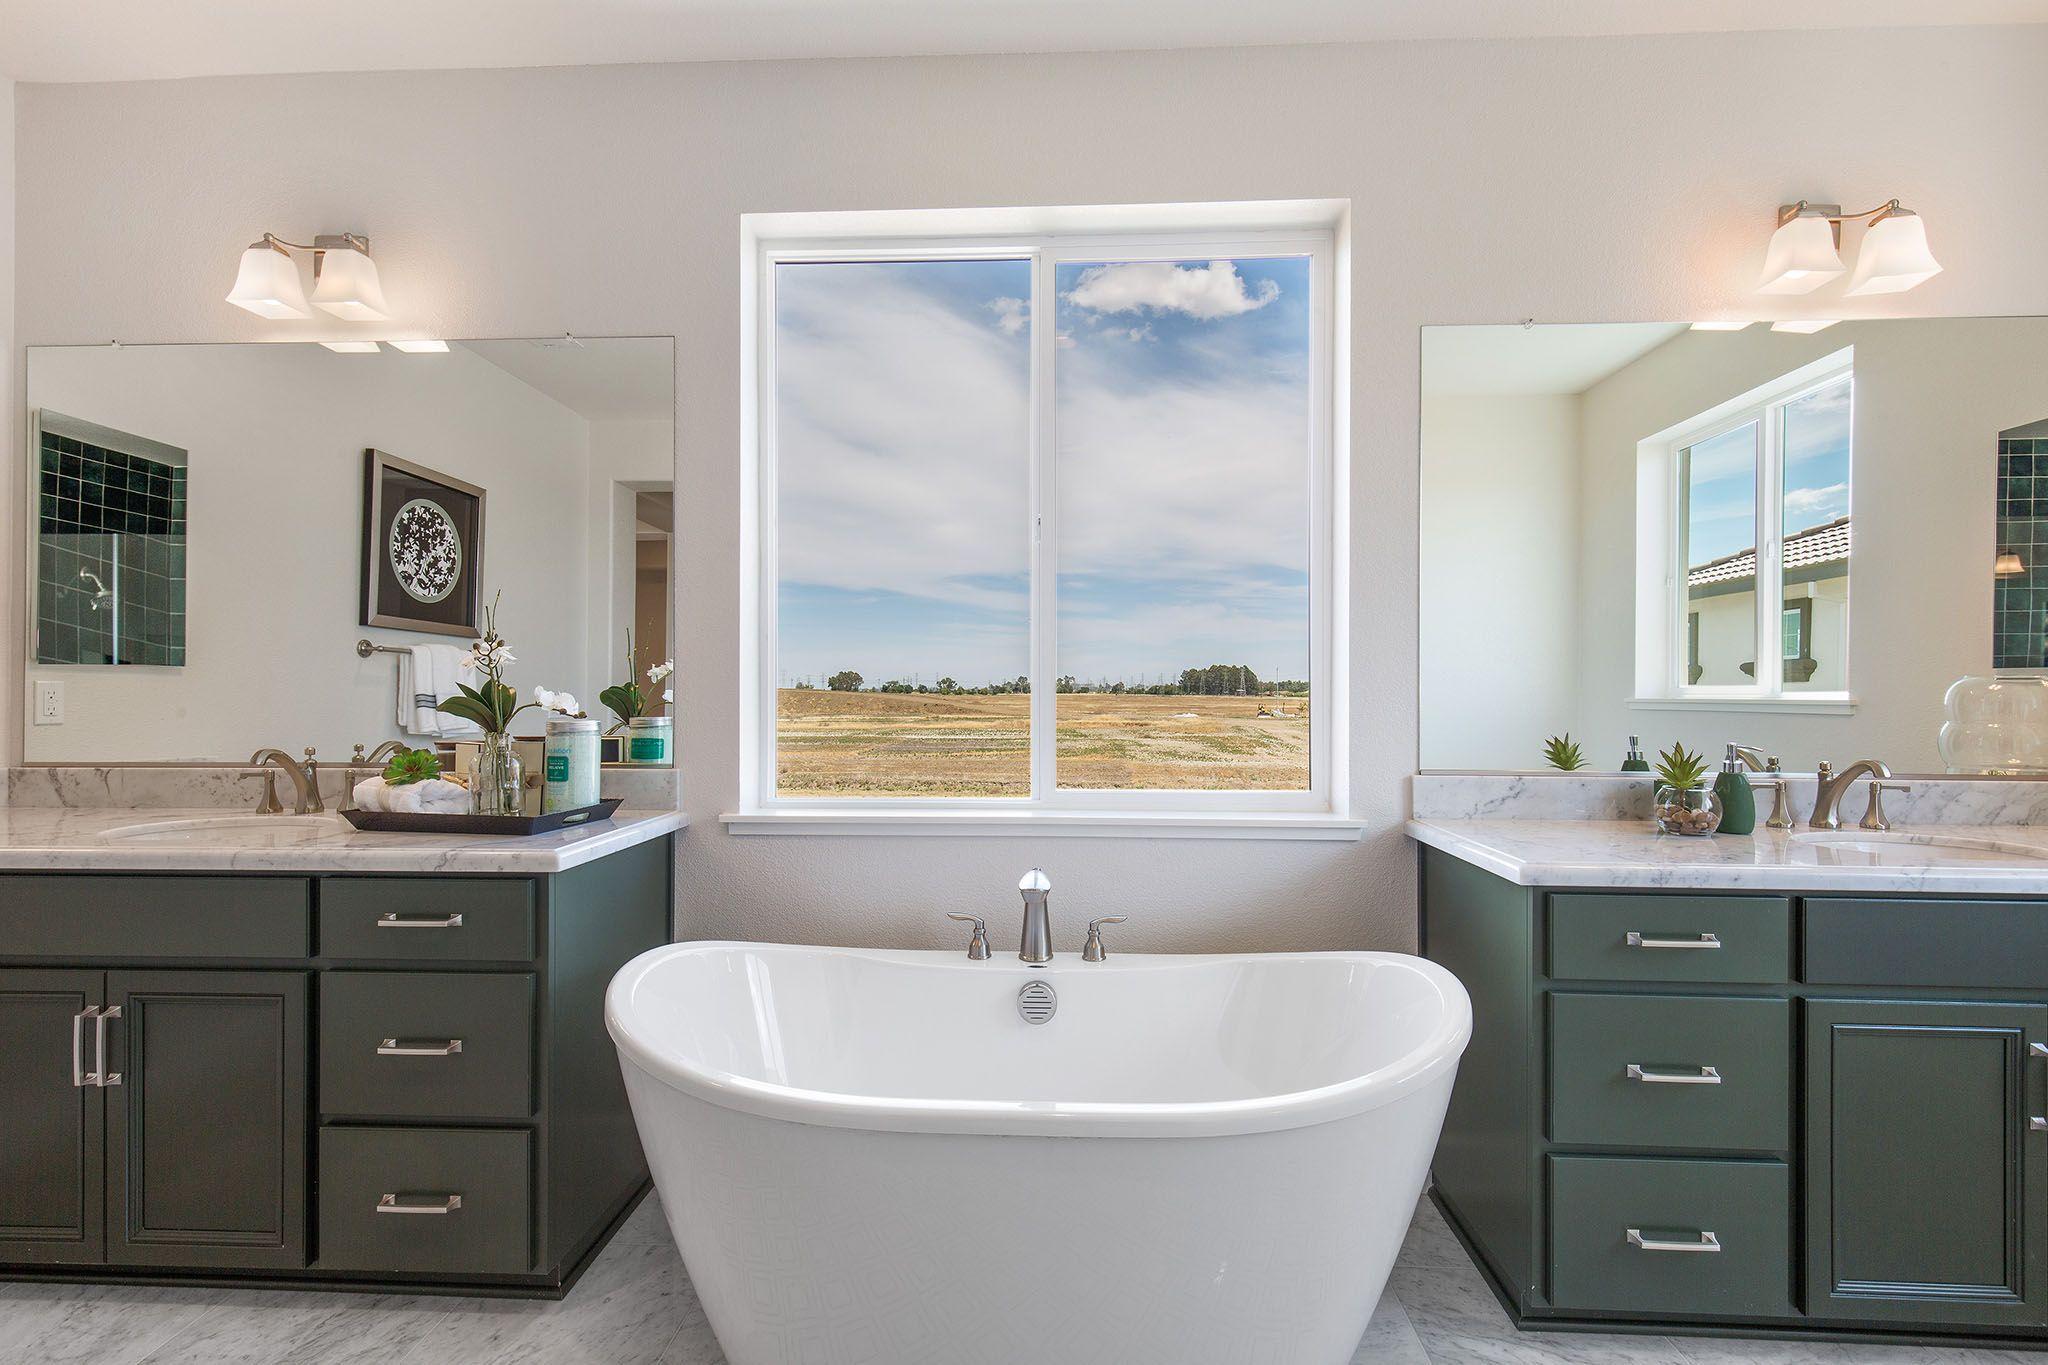 Bathroom featured in the Dalton By Seeno Homes in Vallejo-Napa, CA